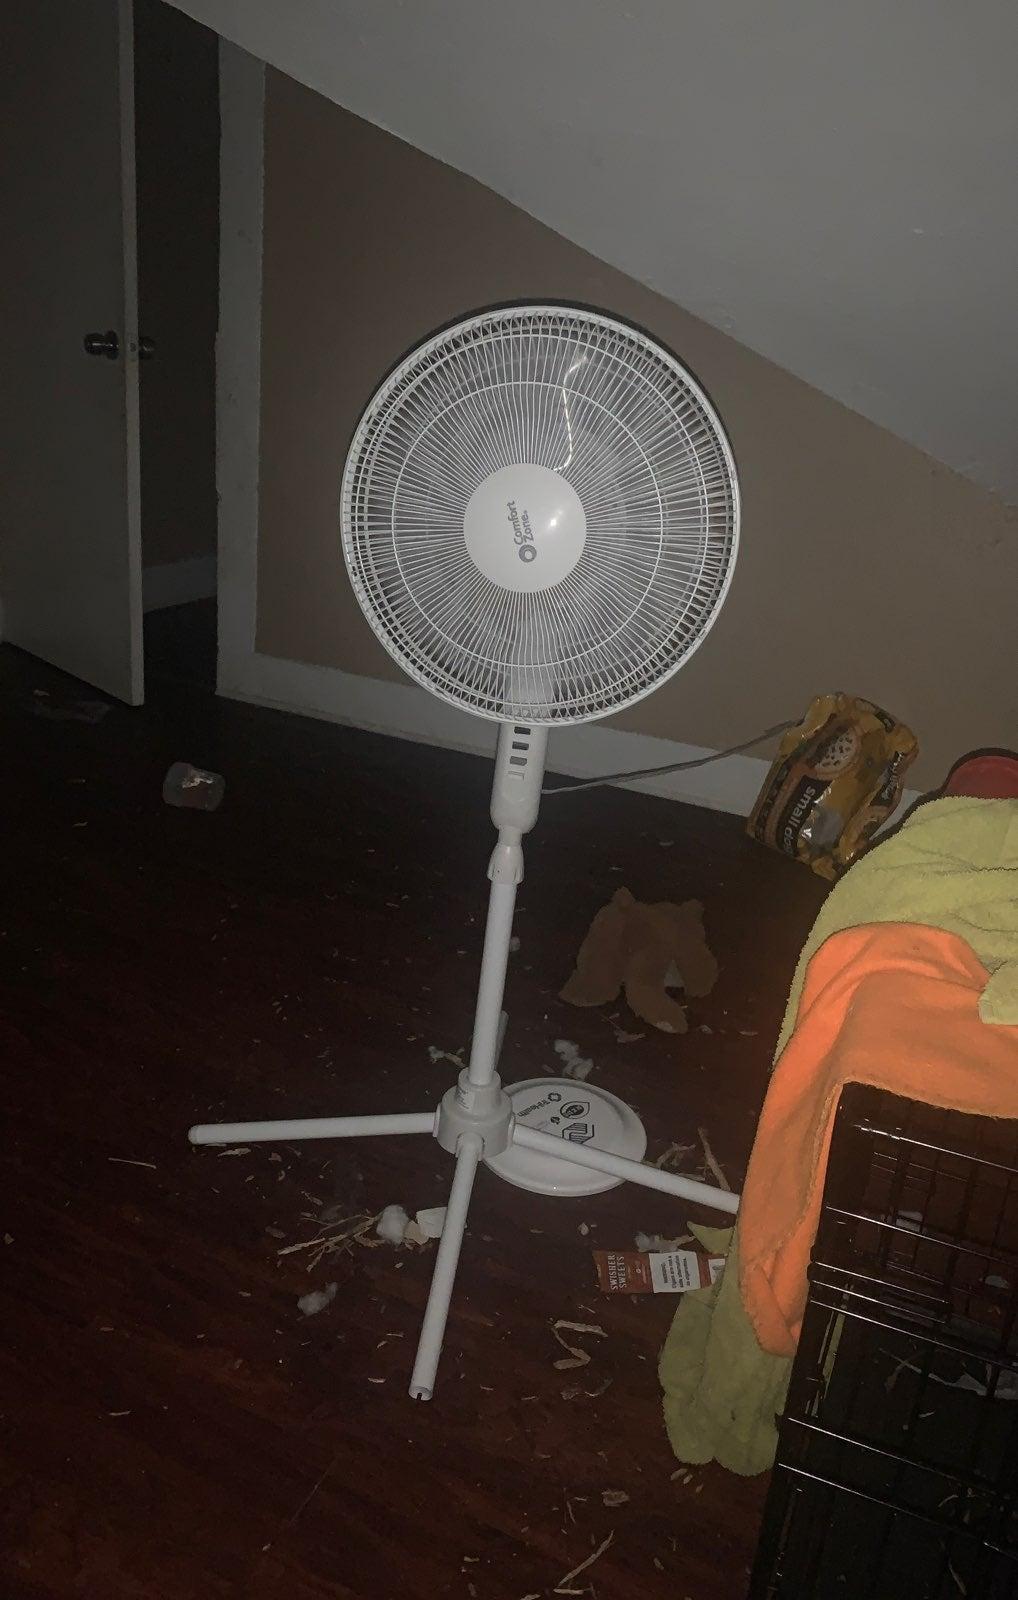 A 24 inch rotating fan